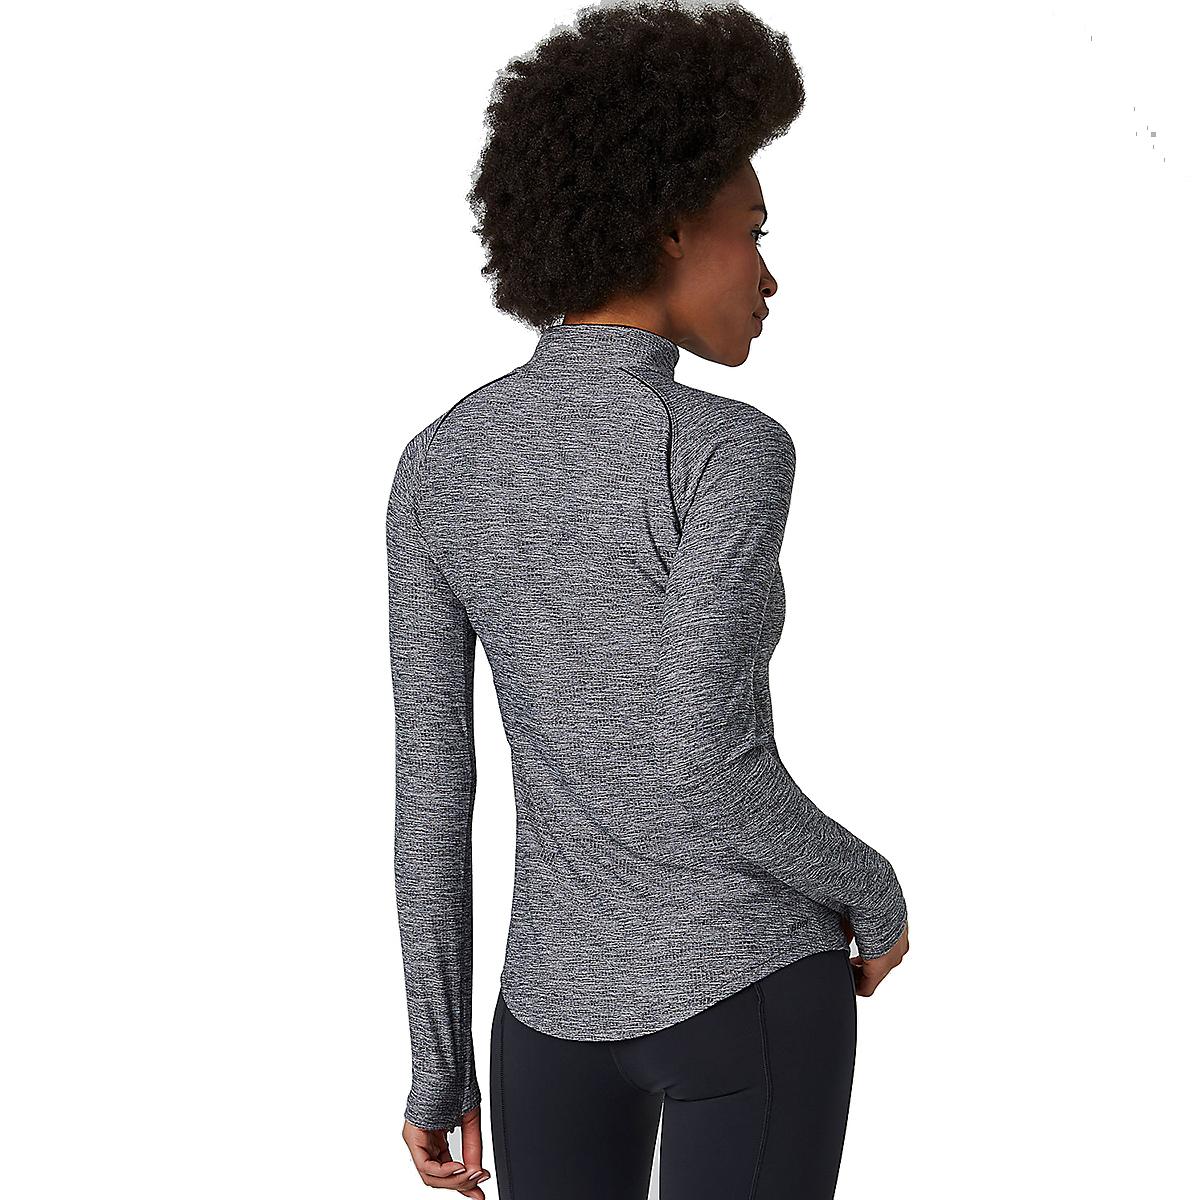 Women's New Balance Transform 1/2 Zip - Color: Black Heather - Size: XS, Black Heather, large, image 4